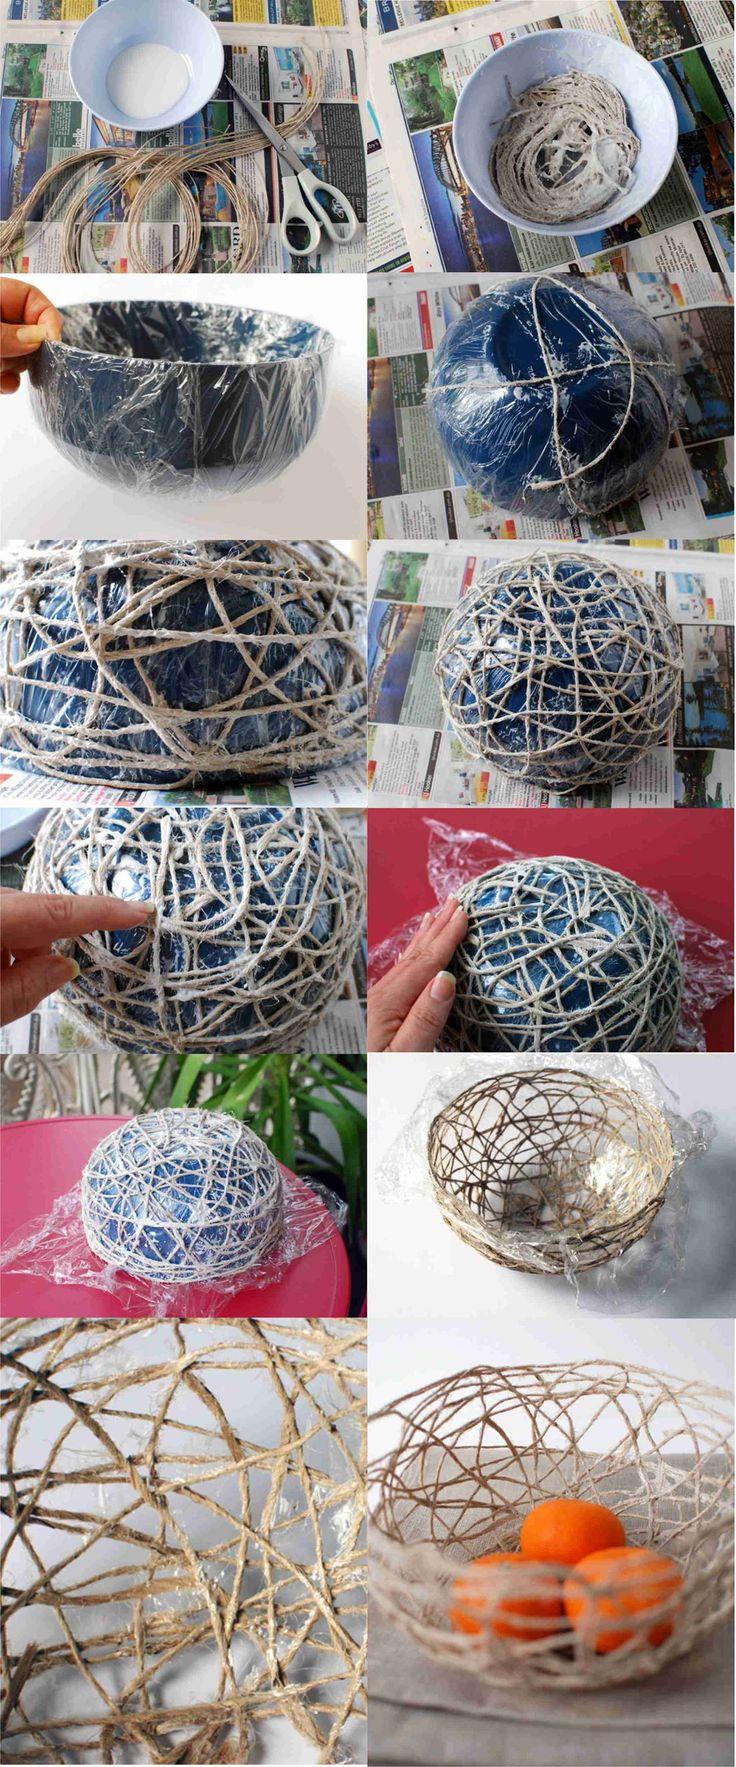 Diy Craft Projects DIY Stunning String Bowl. Equipment used: Fabric stiffener, string, cling film, scissors, bowls.